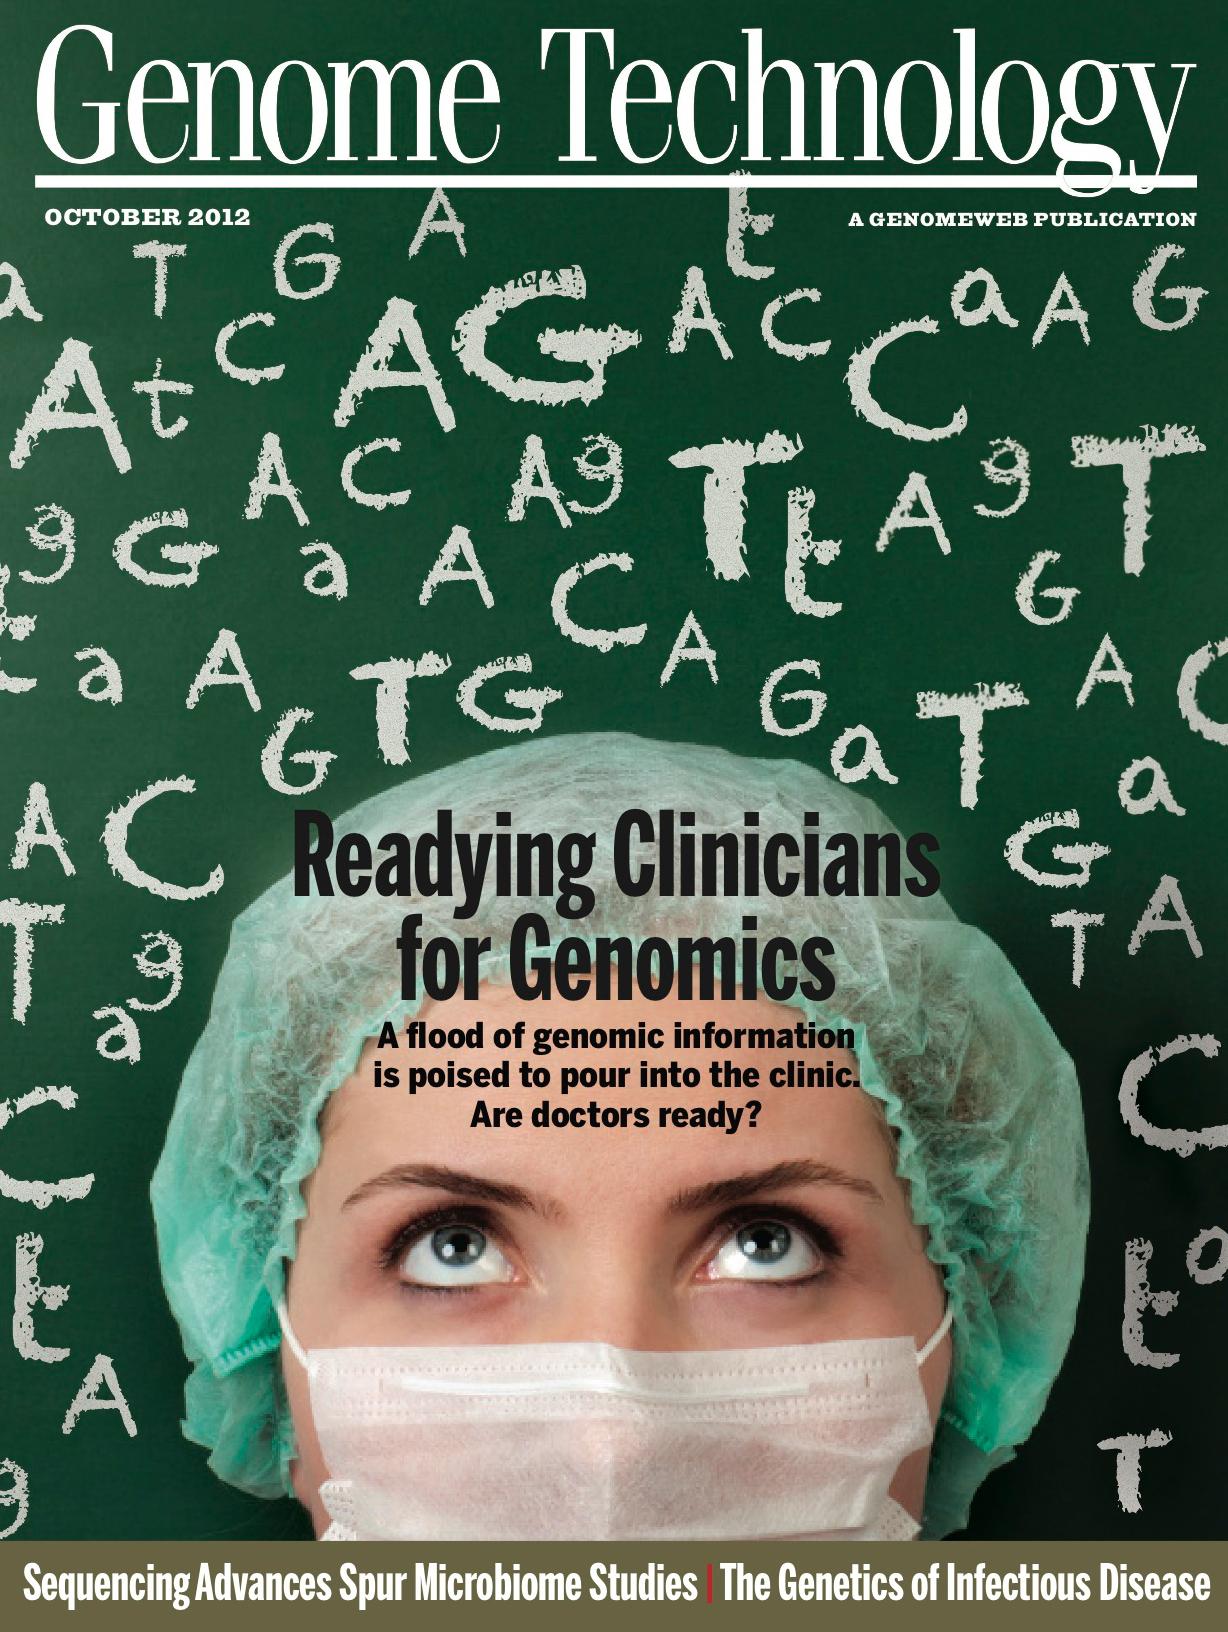 GenomeTech.Oct2pg01.jpg